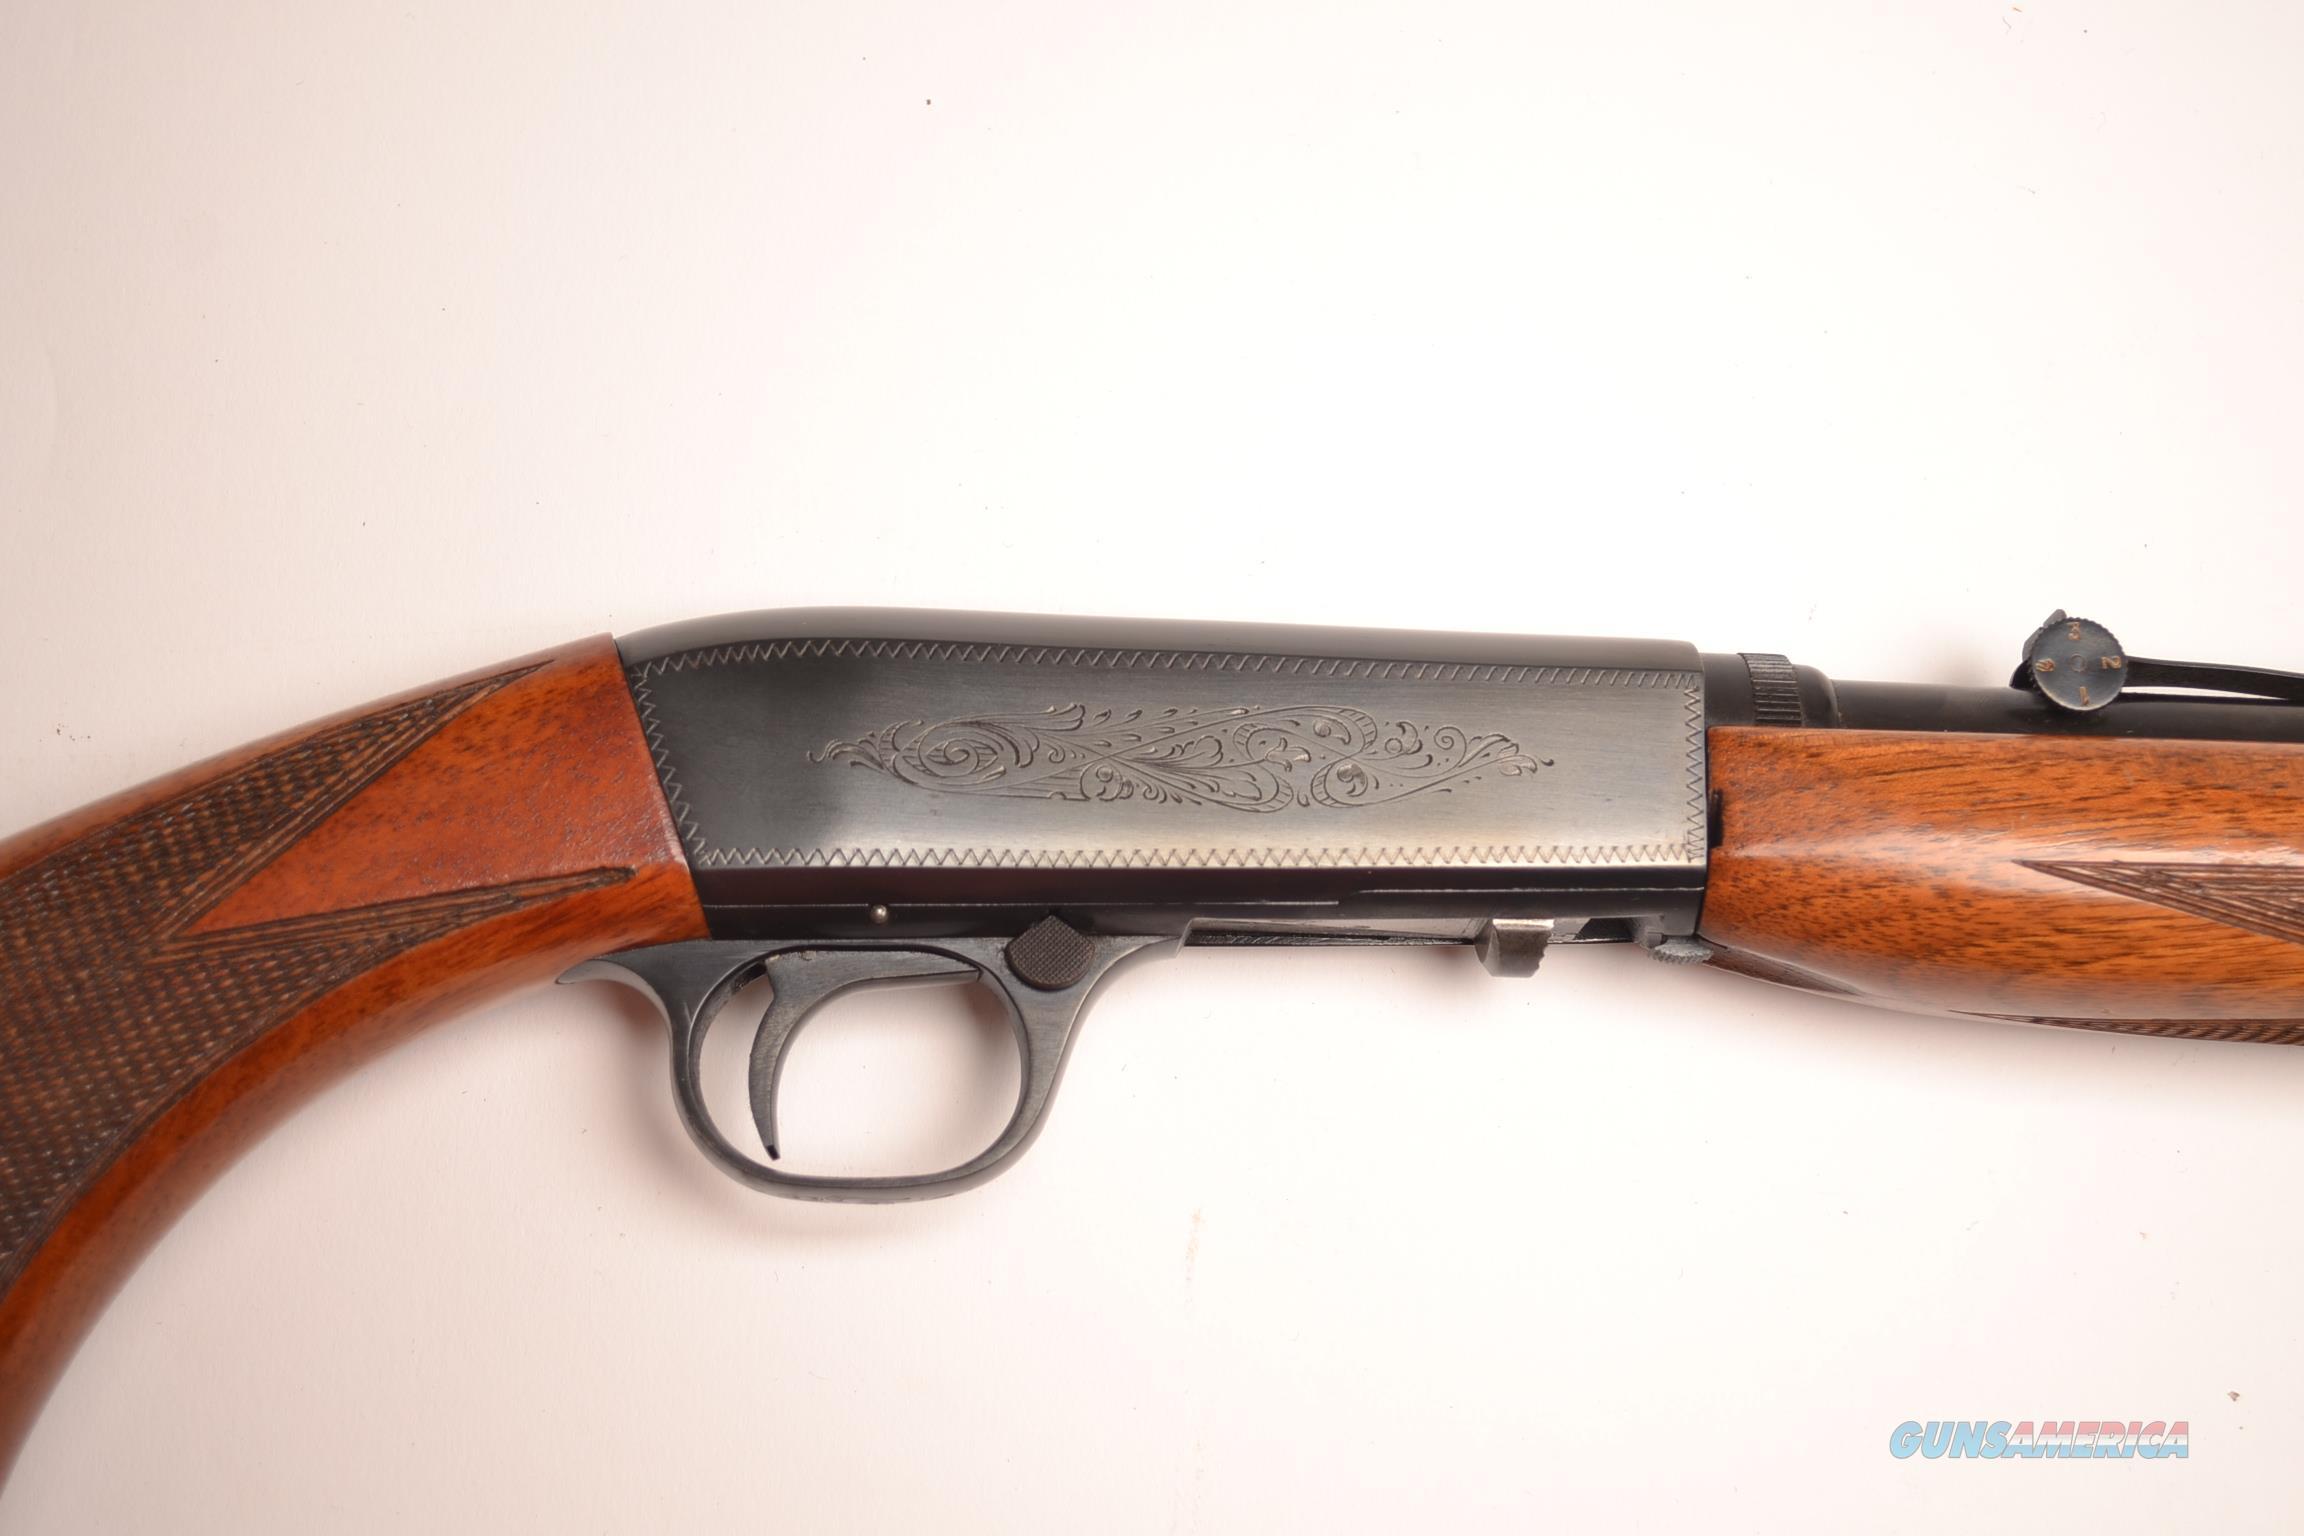 Browning - Takedown, .22 Short  Guns > Rifles > Browning Rifles > Semi Auto > Hunting